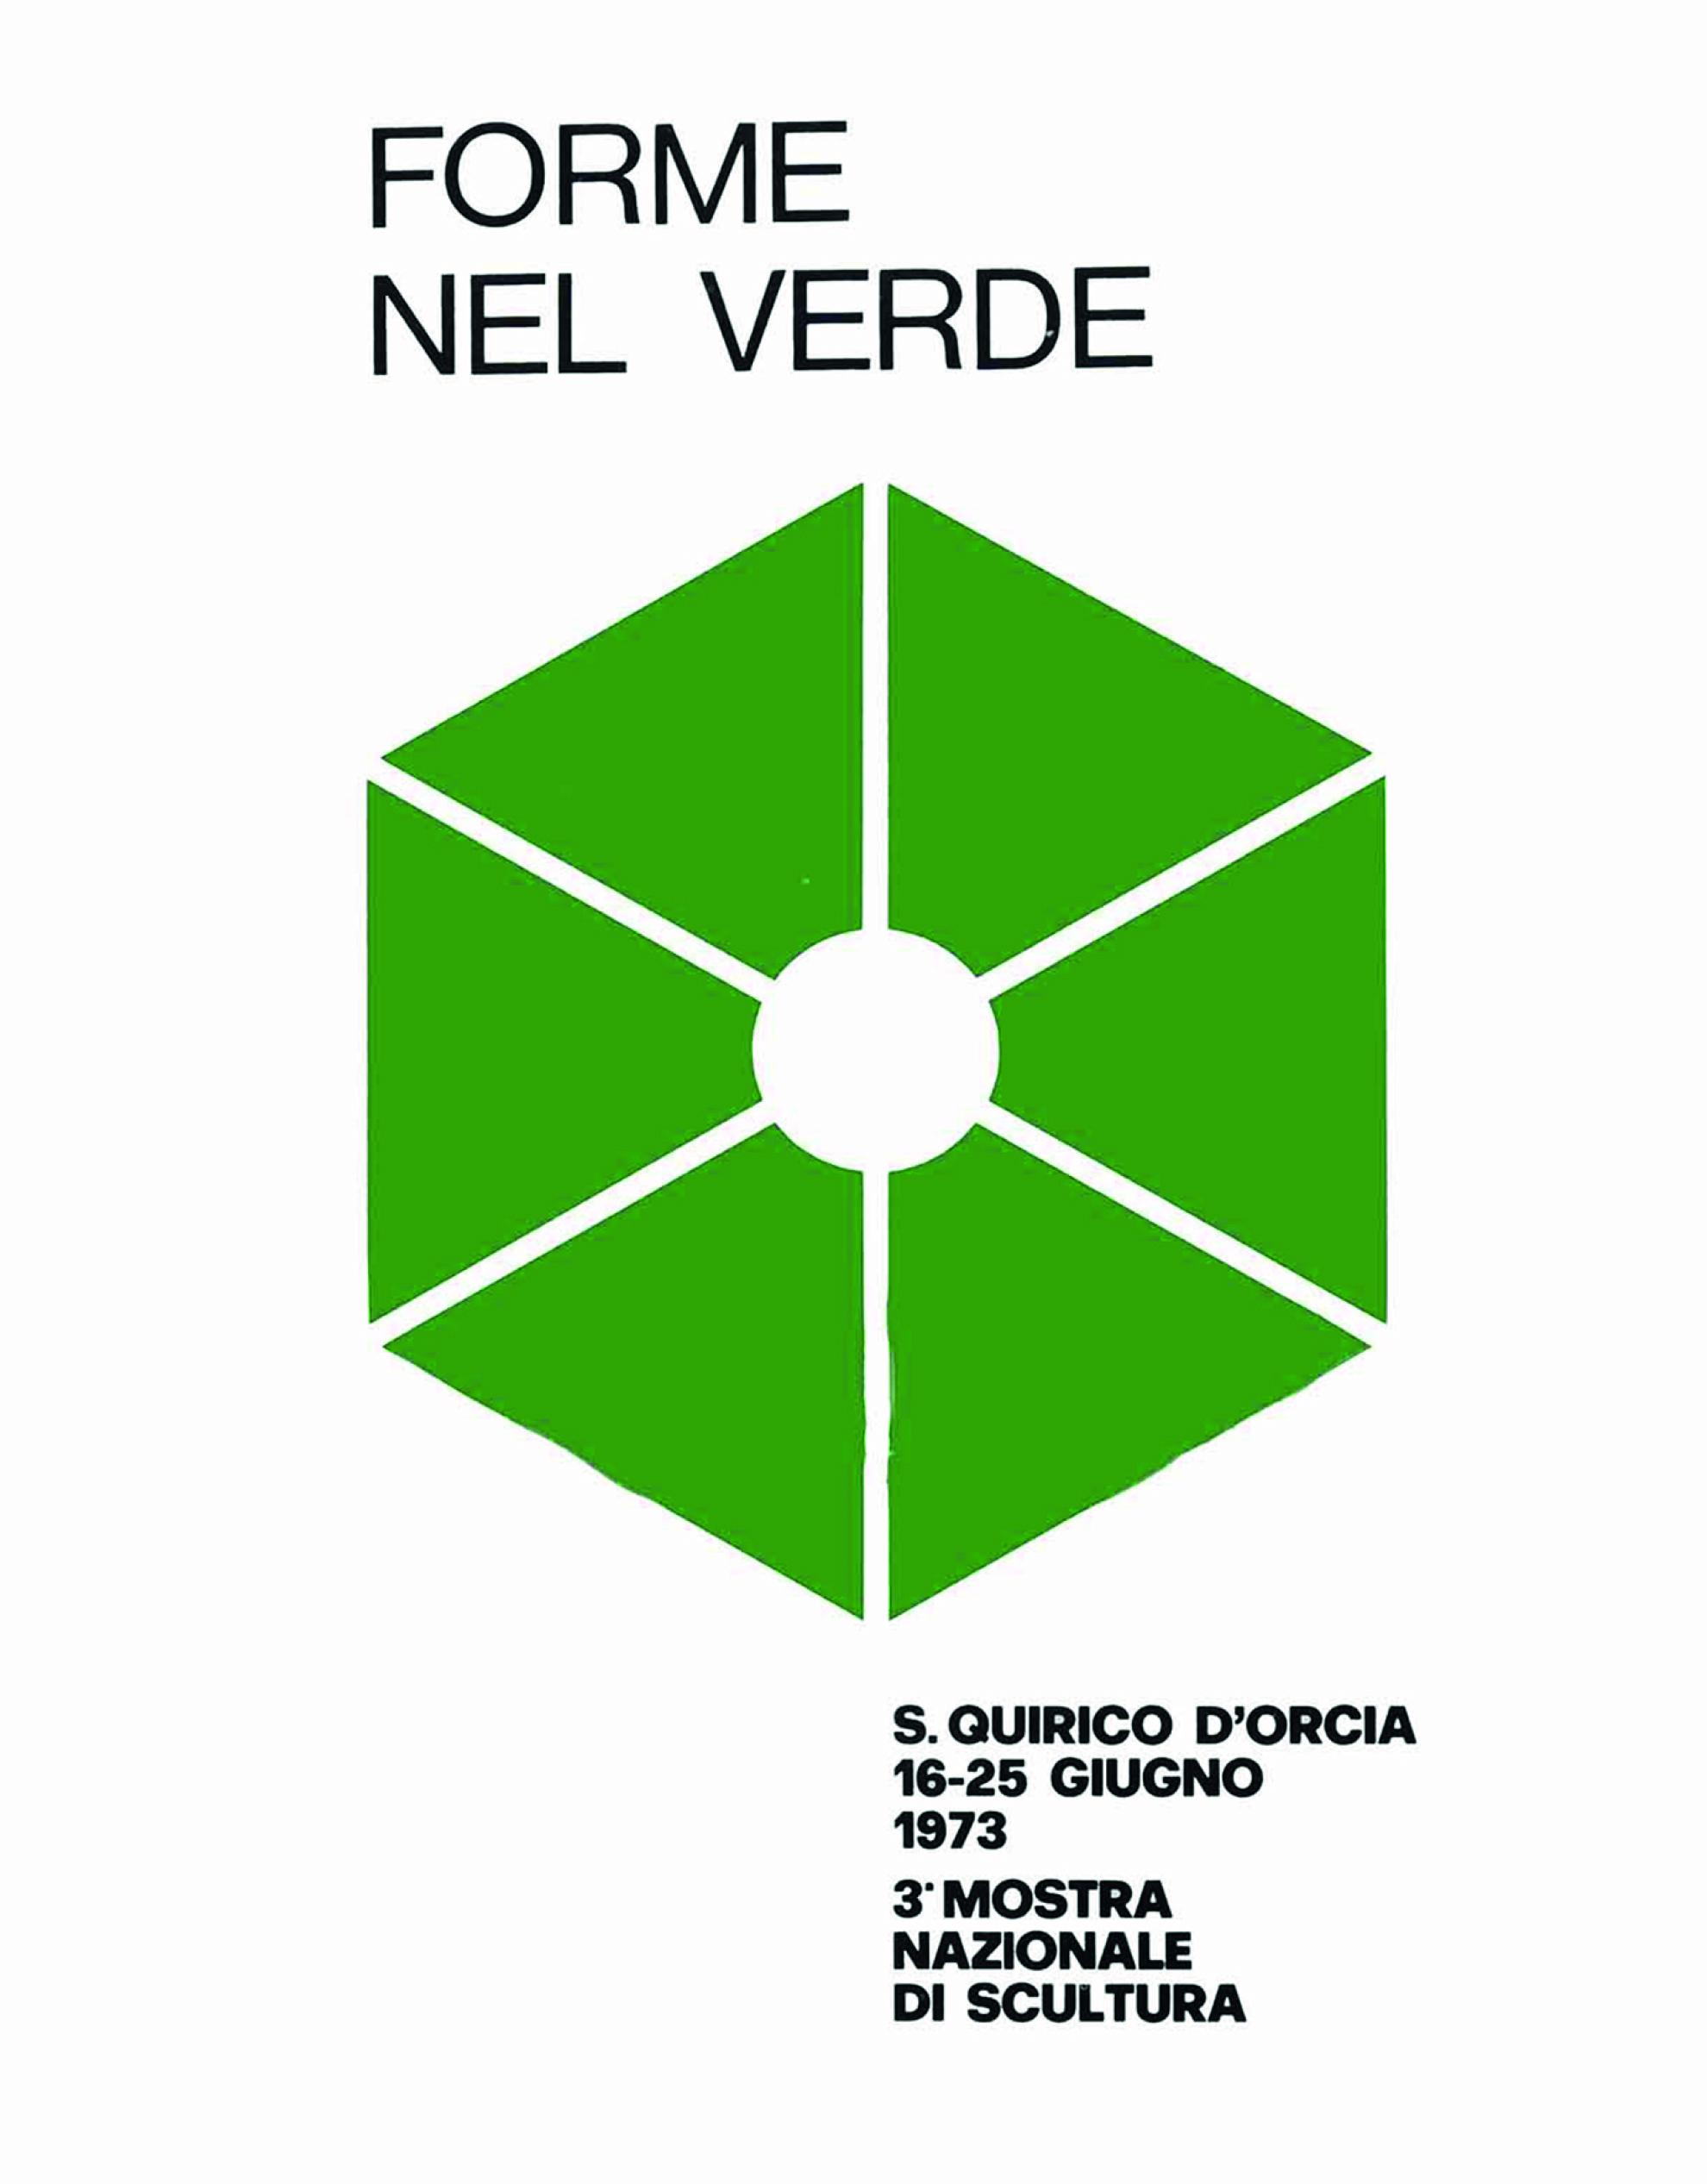 Catalogo Forme nel Verde 1973